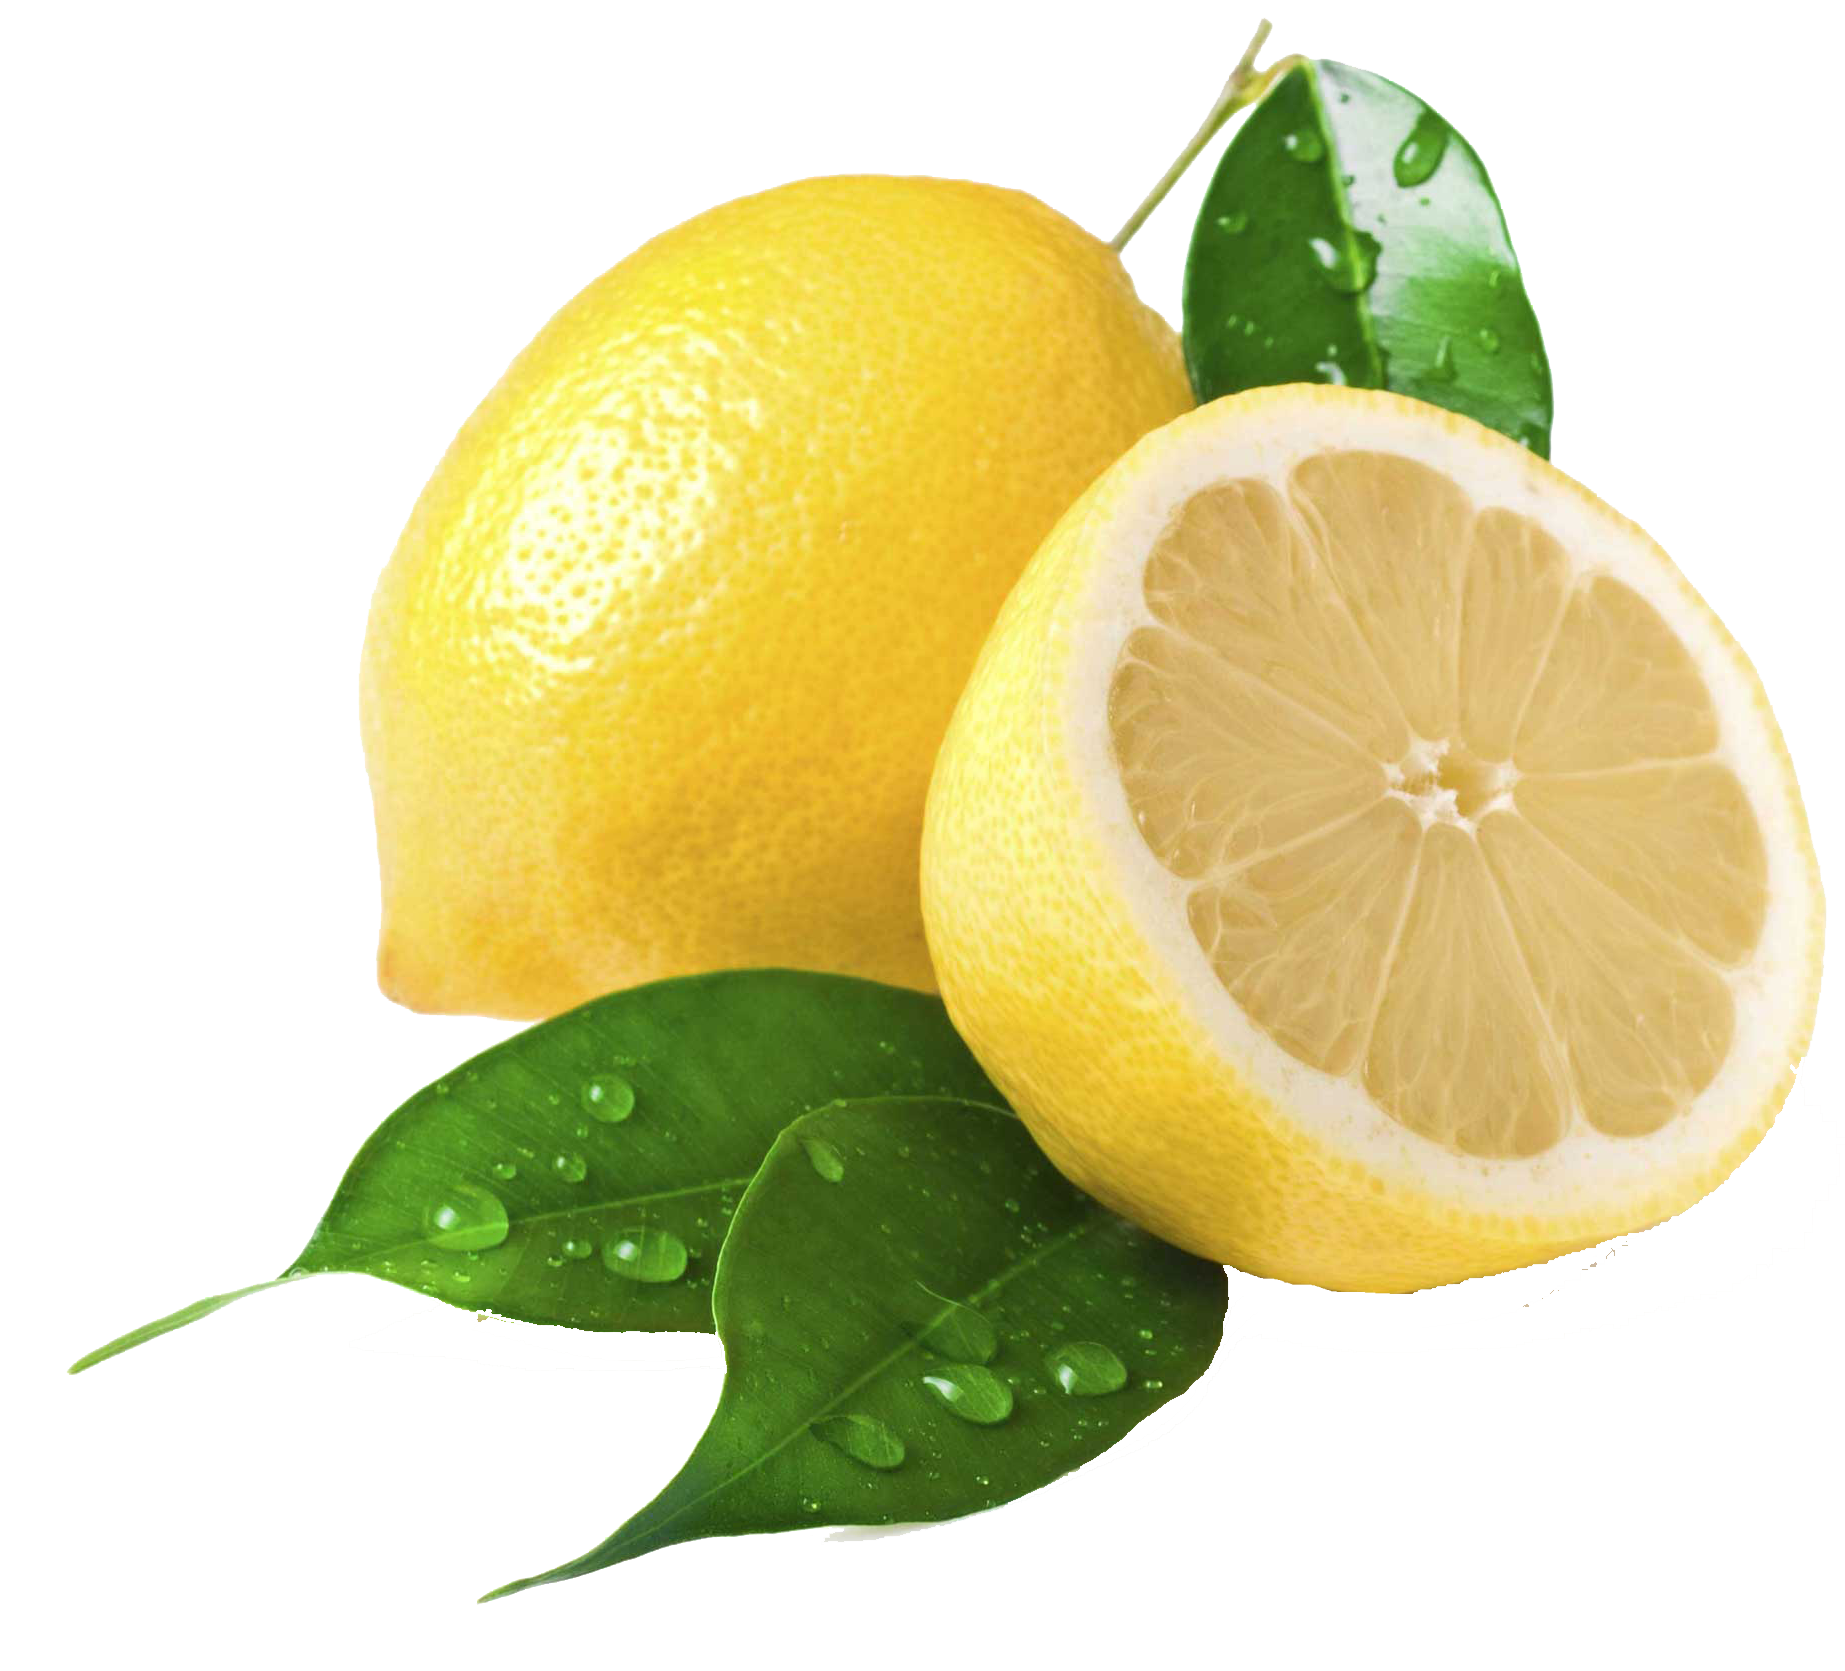 Png image purepng free. Clipart fruit lemon